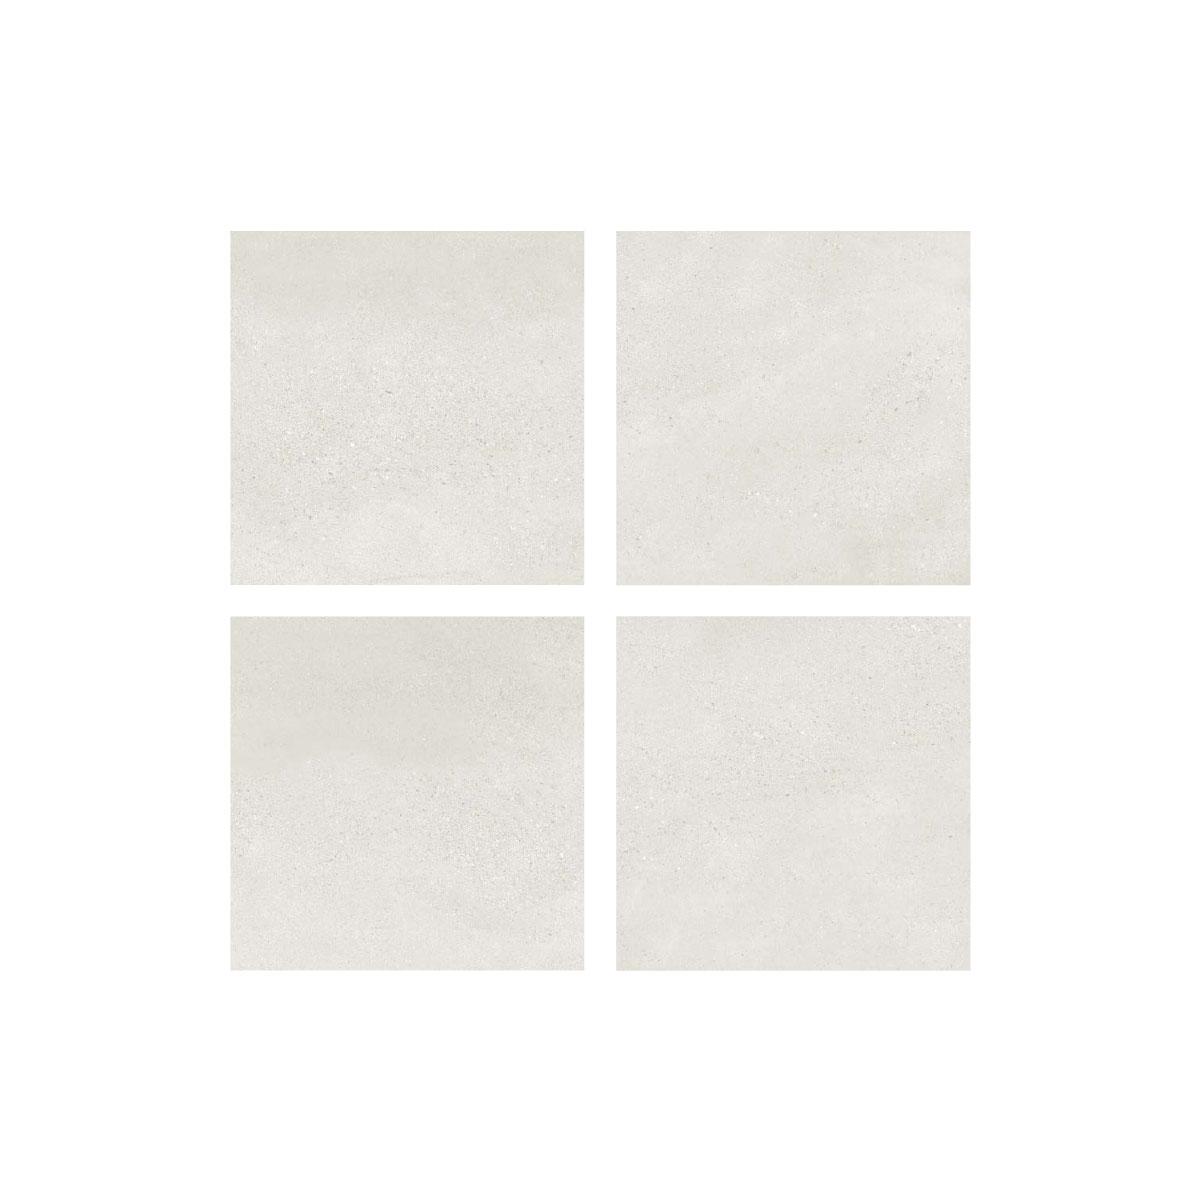 Moonstone - Bianco - Concrete Look Tiles - 600x600mm - Stone3